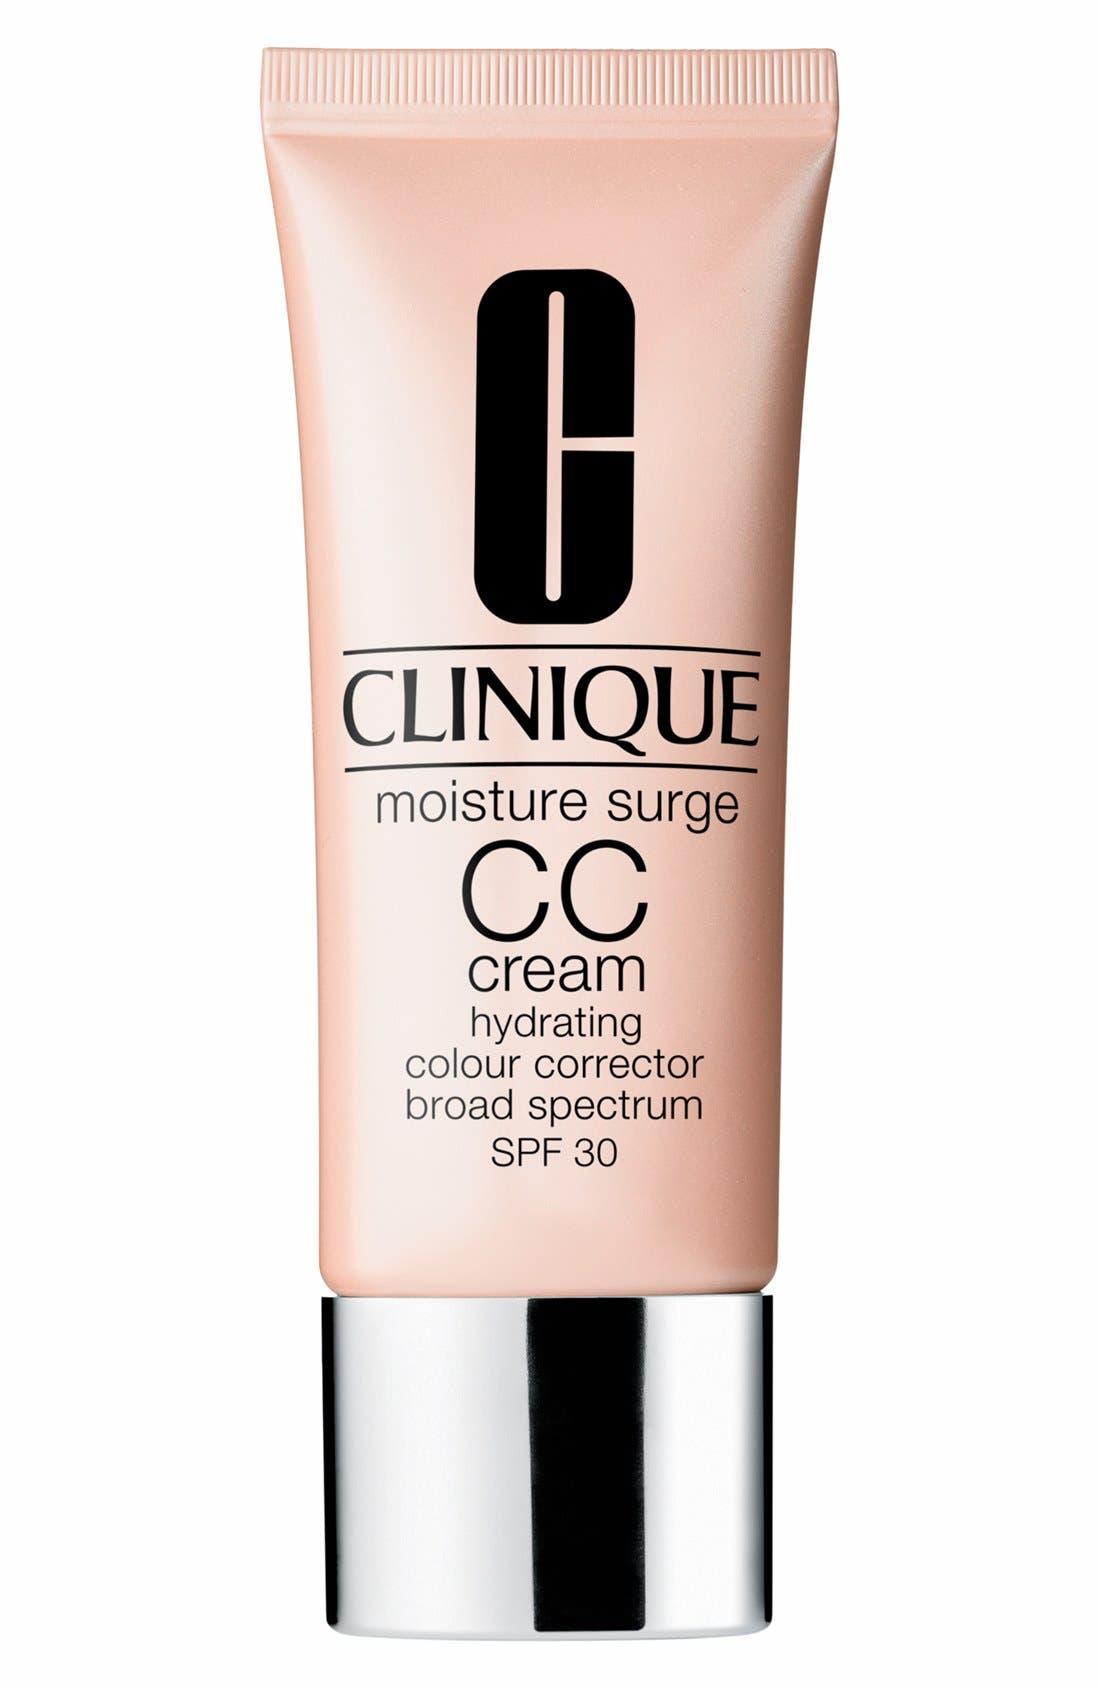 Moisture Surge CC Cream Hydrating Colour Corrector Broad Spectrum SPF 30,                             Main thumbnail 1, color,                             VERY LIGHT